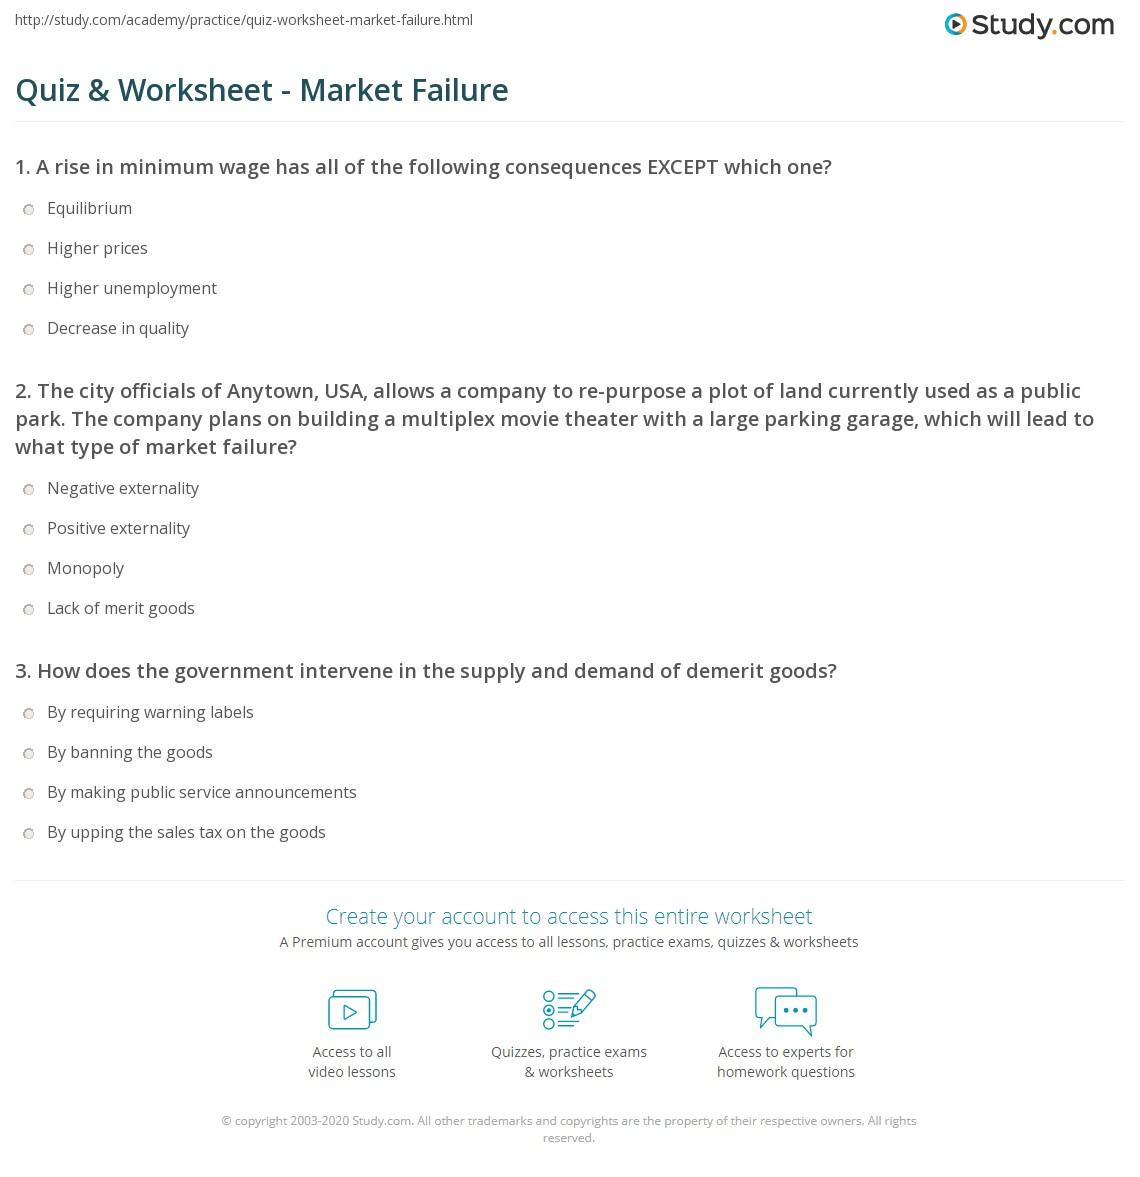 math worksheet : quiz  worksheet  market failure  study  : Market Math Worksheets